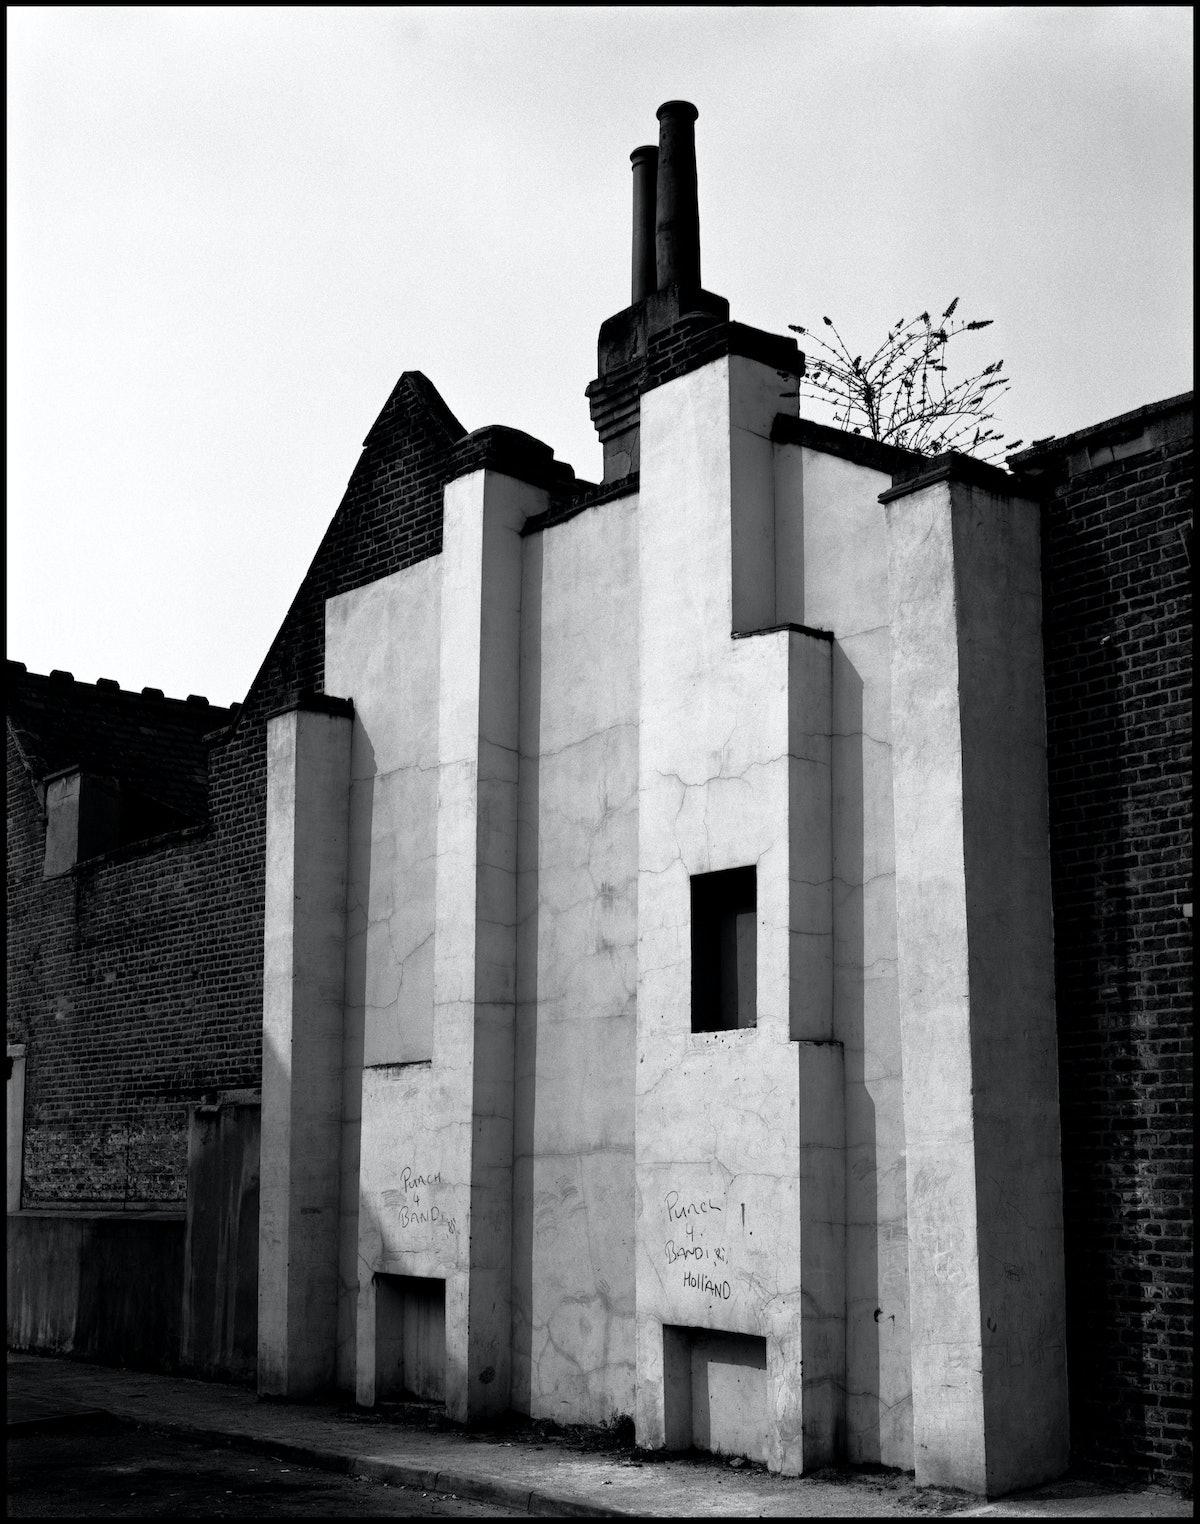 NW1-117-442-Manley-Street-1982-low-res.jpg